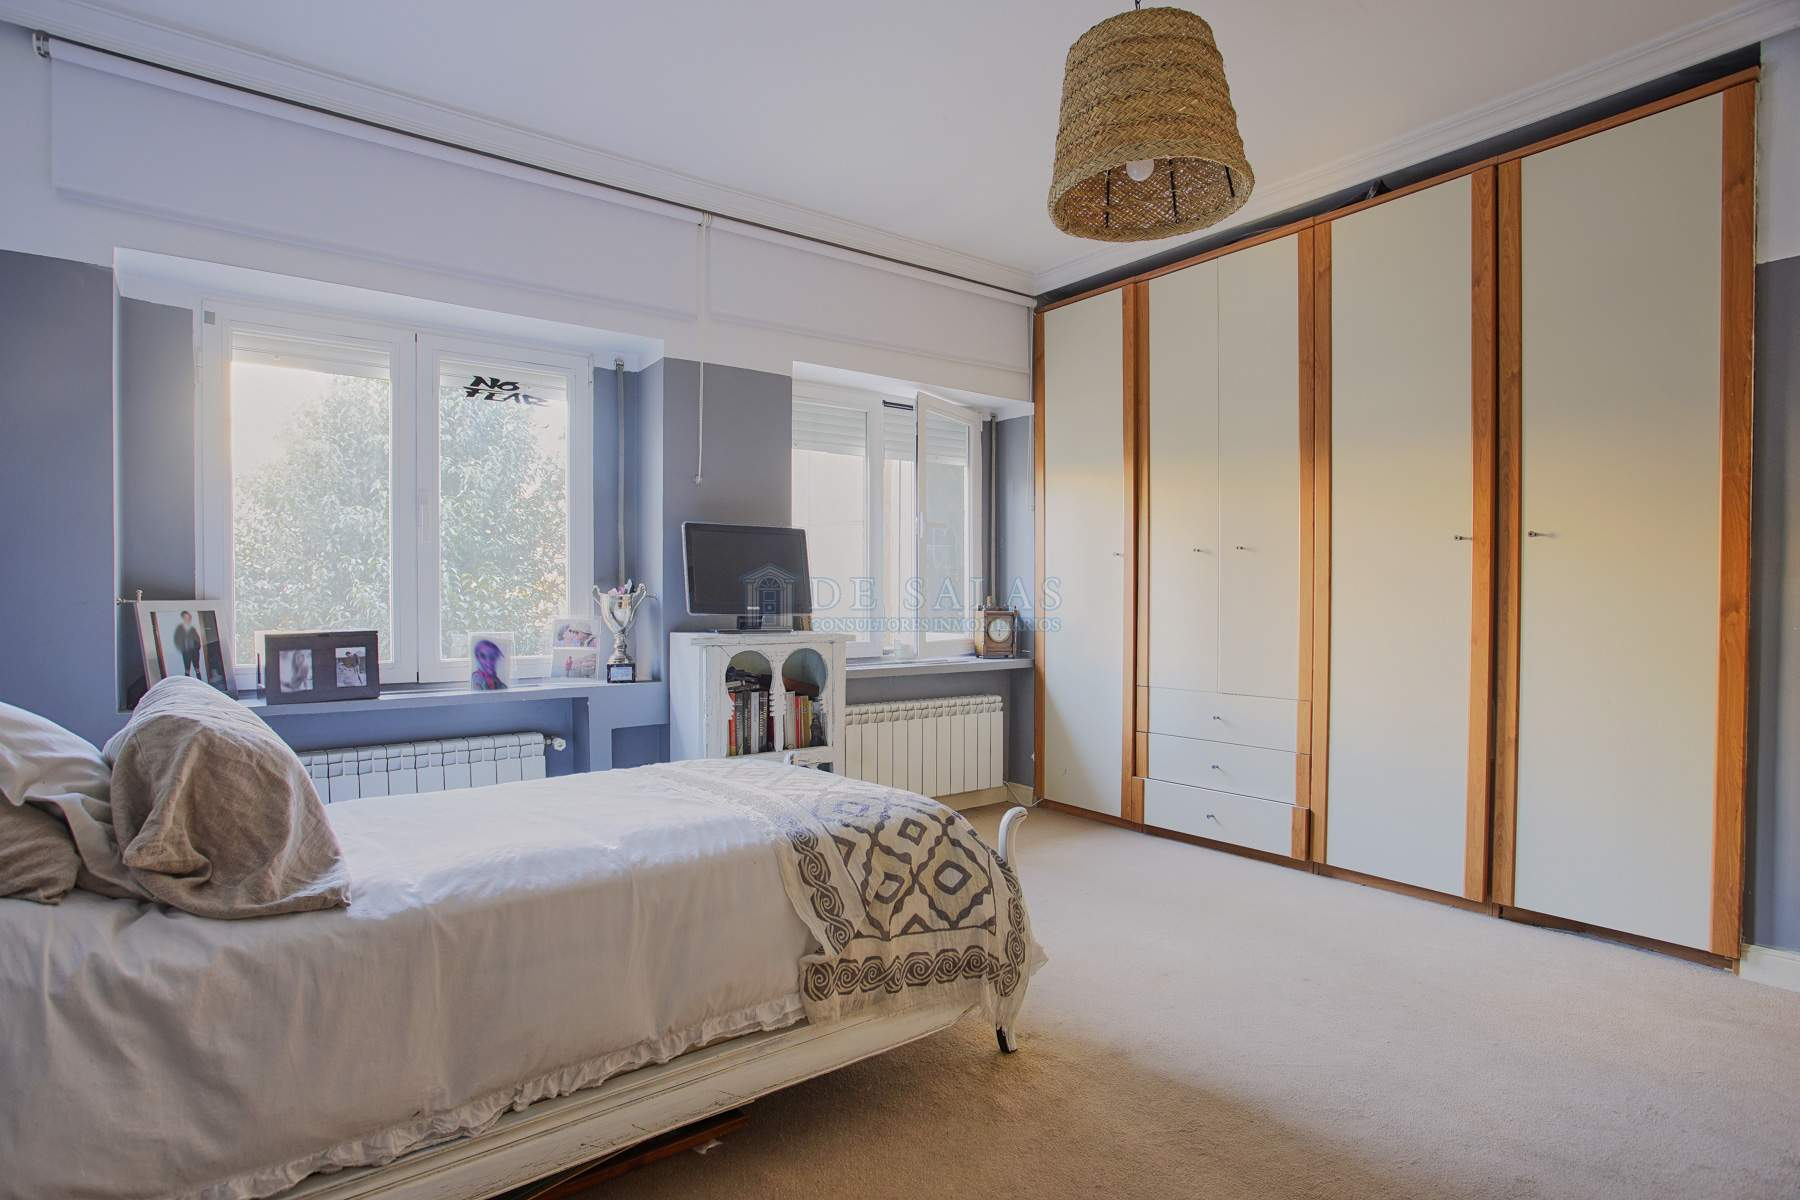 Dormitorio-11 Piso Soto de la Moraleja